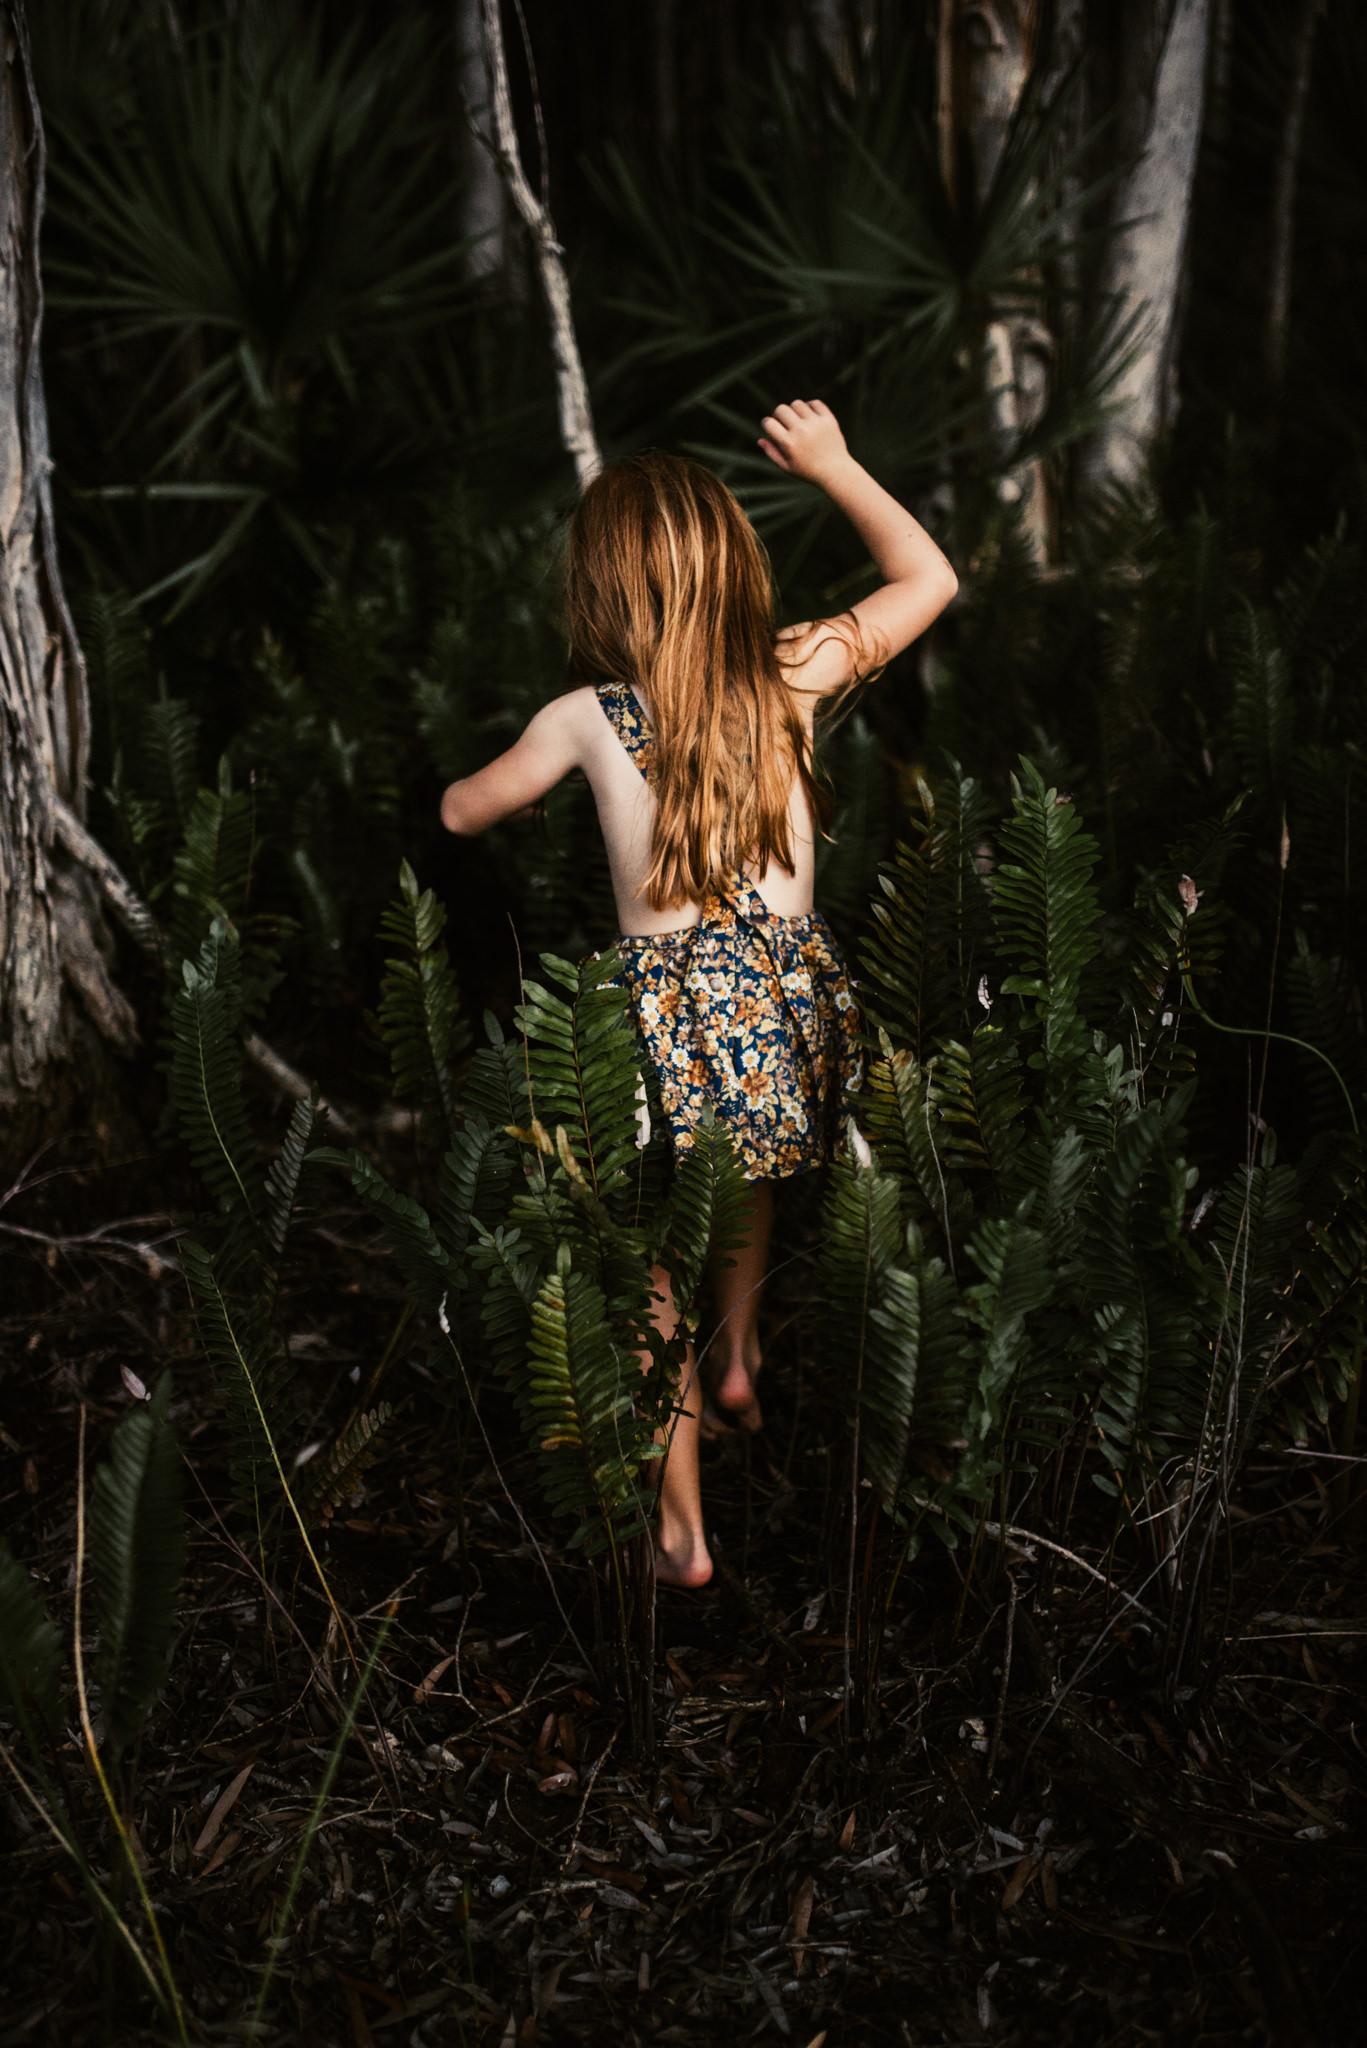 twyla jones photography - treasure coast florida - childrens adventure clothing commercial shoot--58.jpg